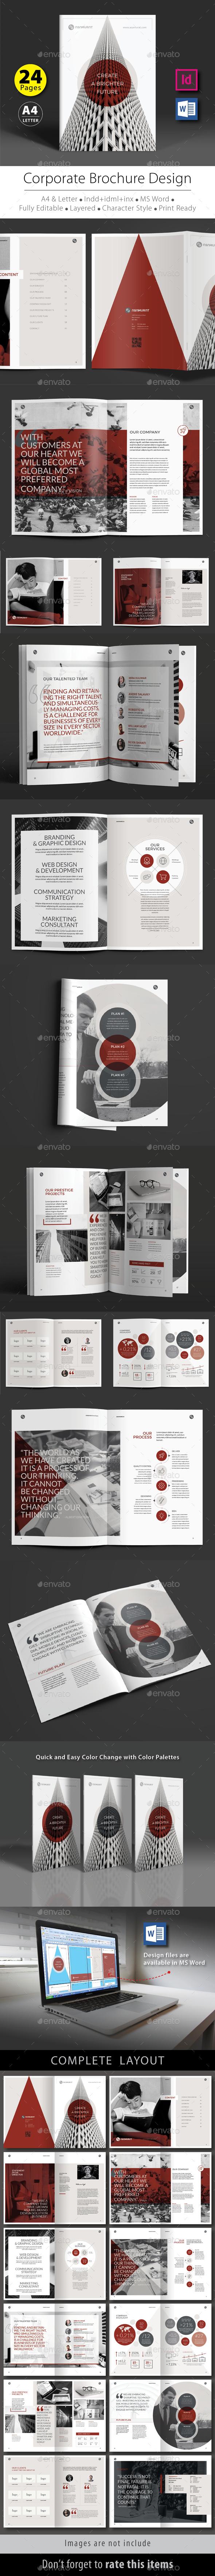 Corporate Brochure Design Template V.3 - Corporate Brochures